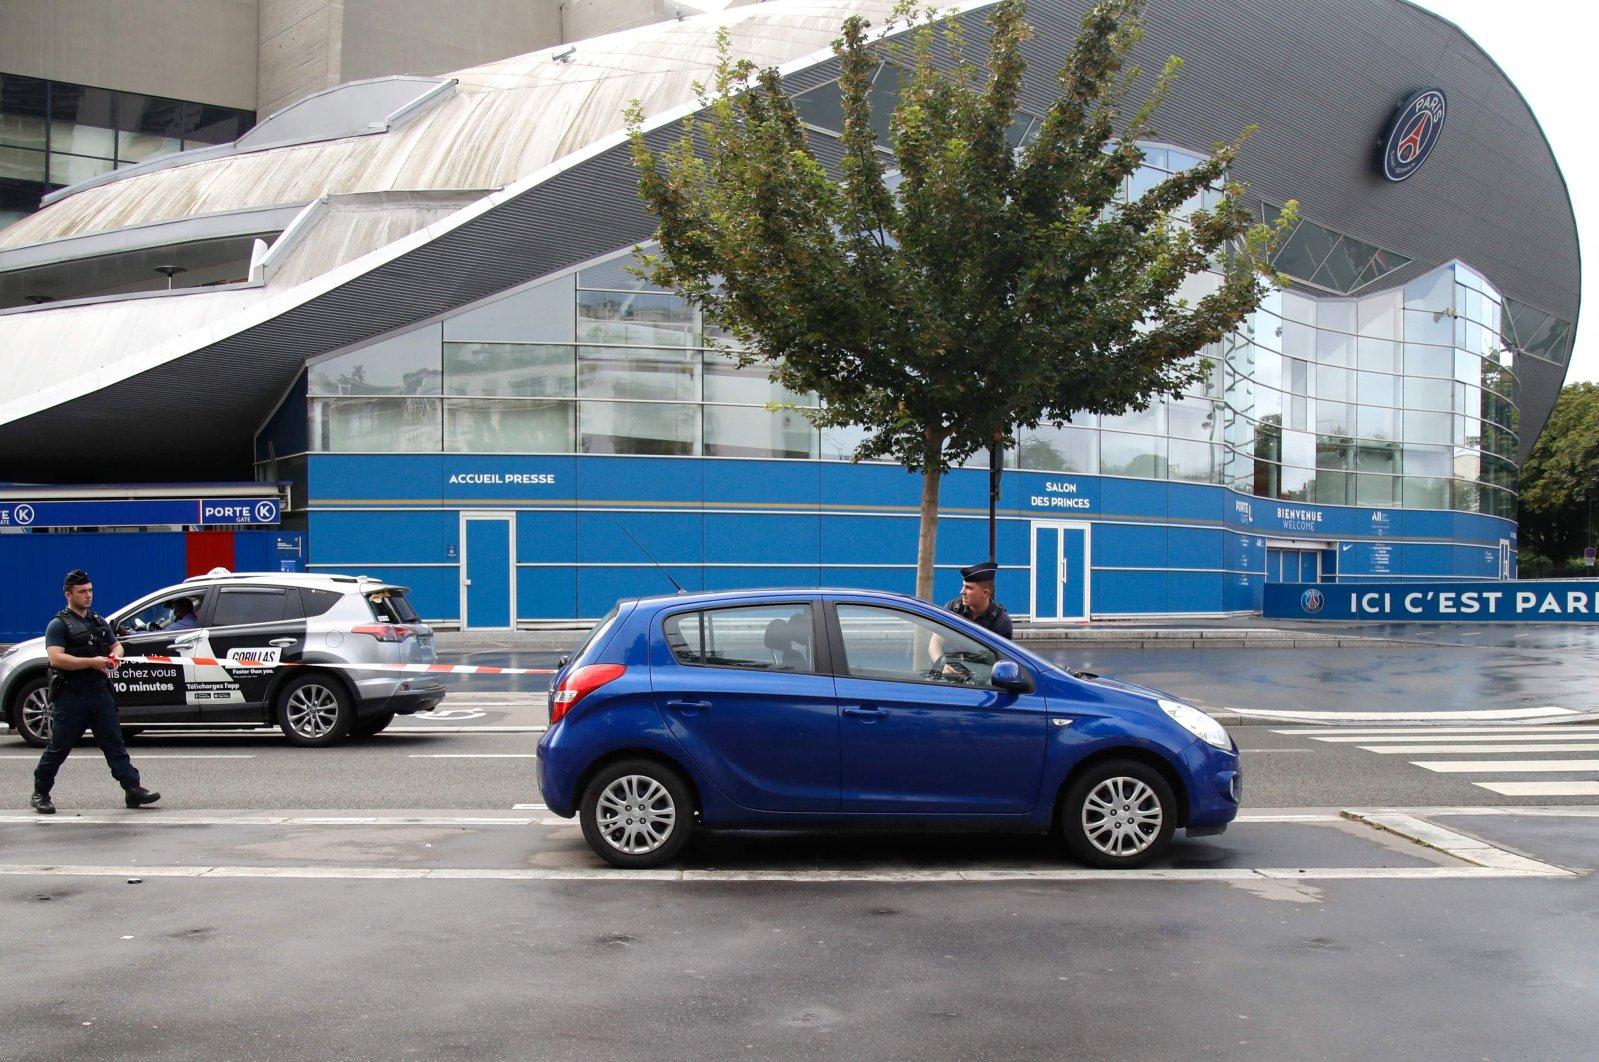 Police officers establish a security perimeter around the Parc des Princes stadium in Paris, France, Aug. 9, 2021. (AFP Photo)